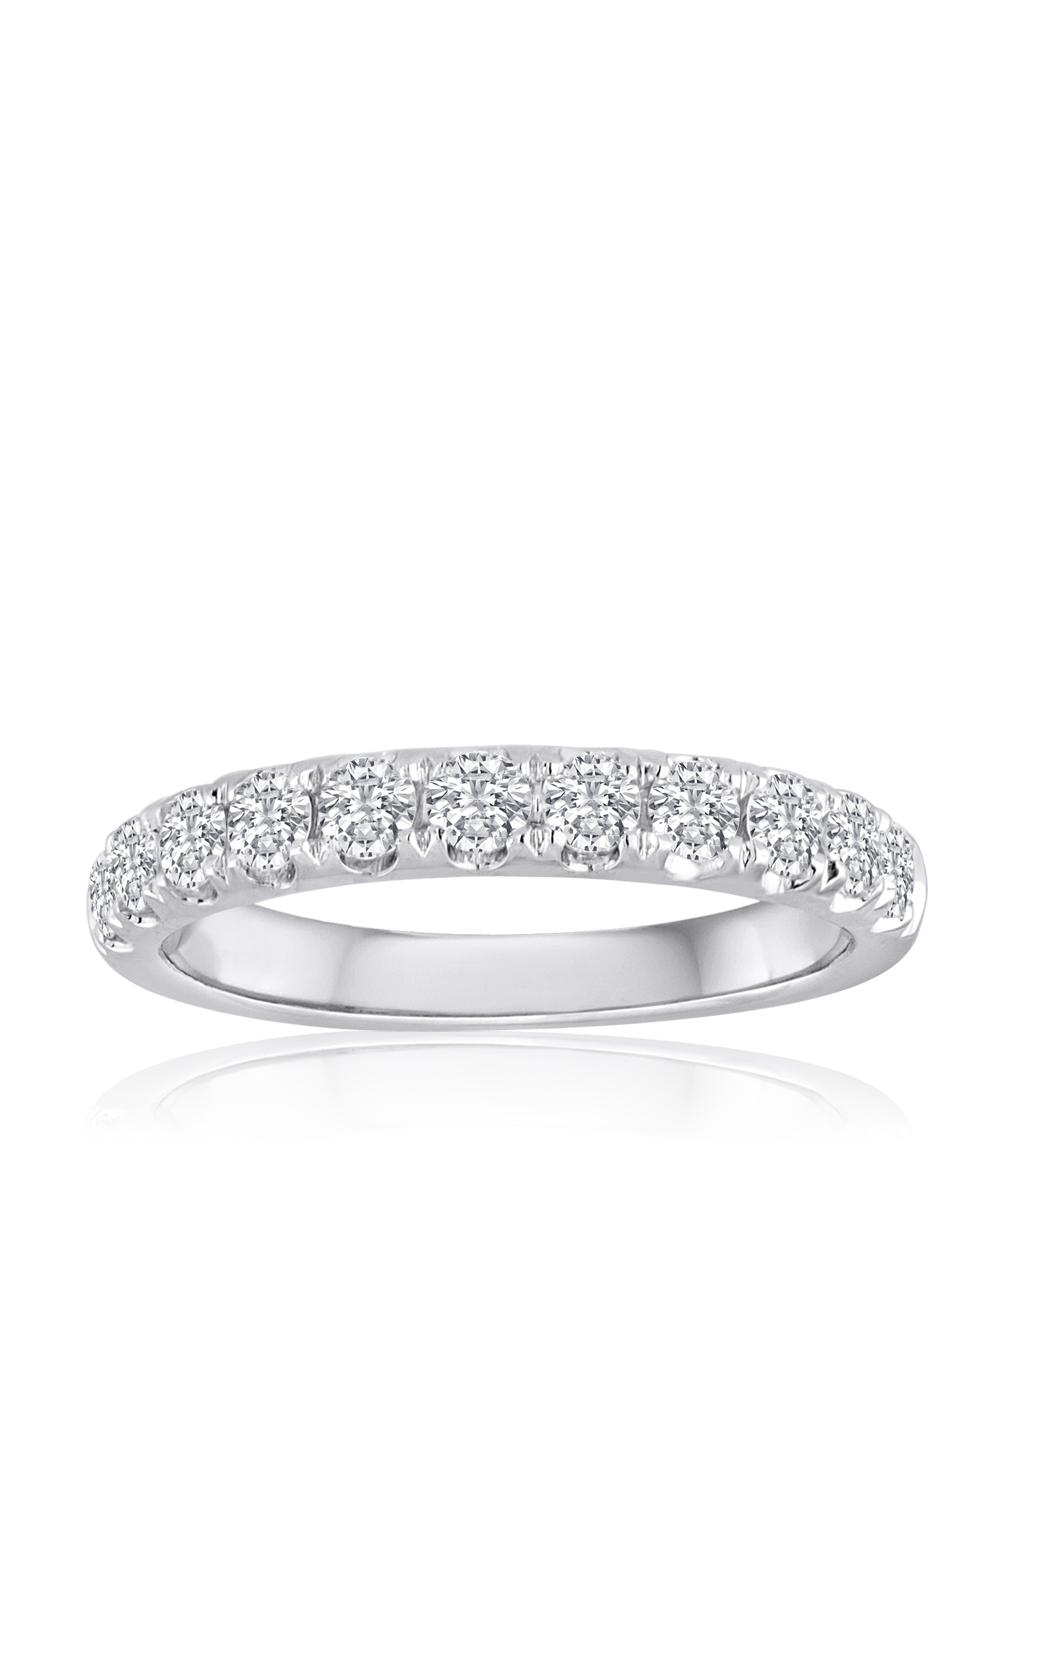 Imagine Bridal Fashion Rings 70156D-1 product image